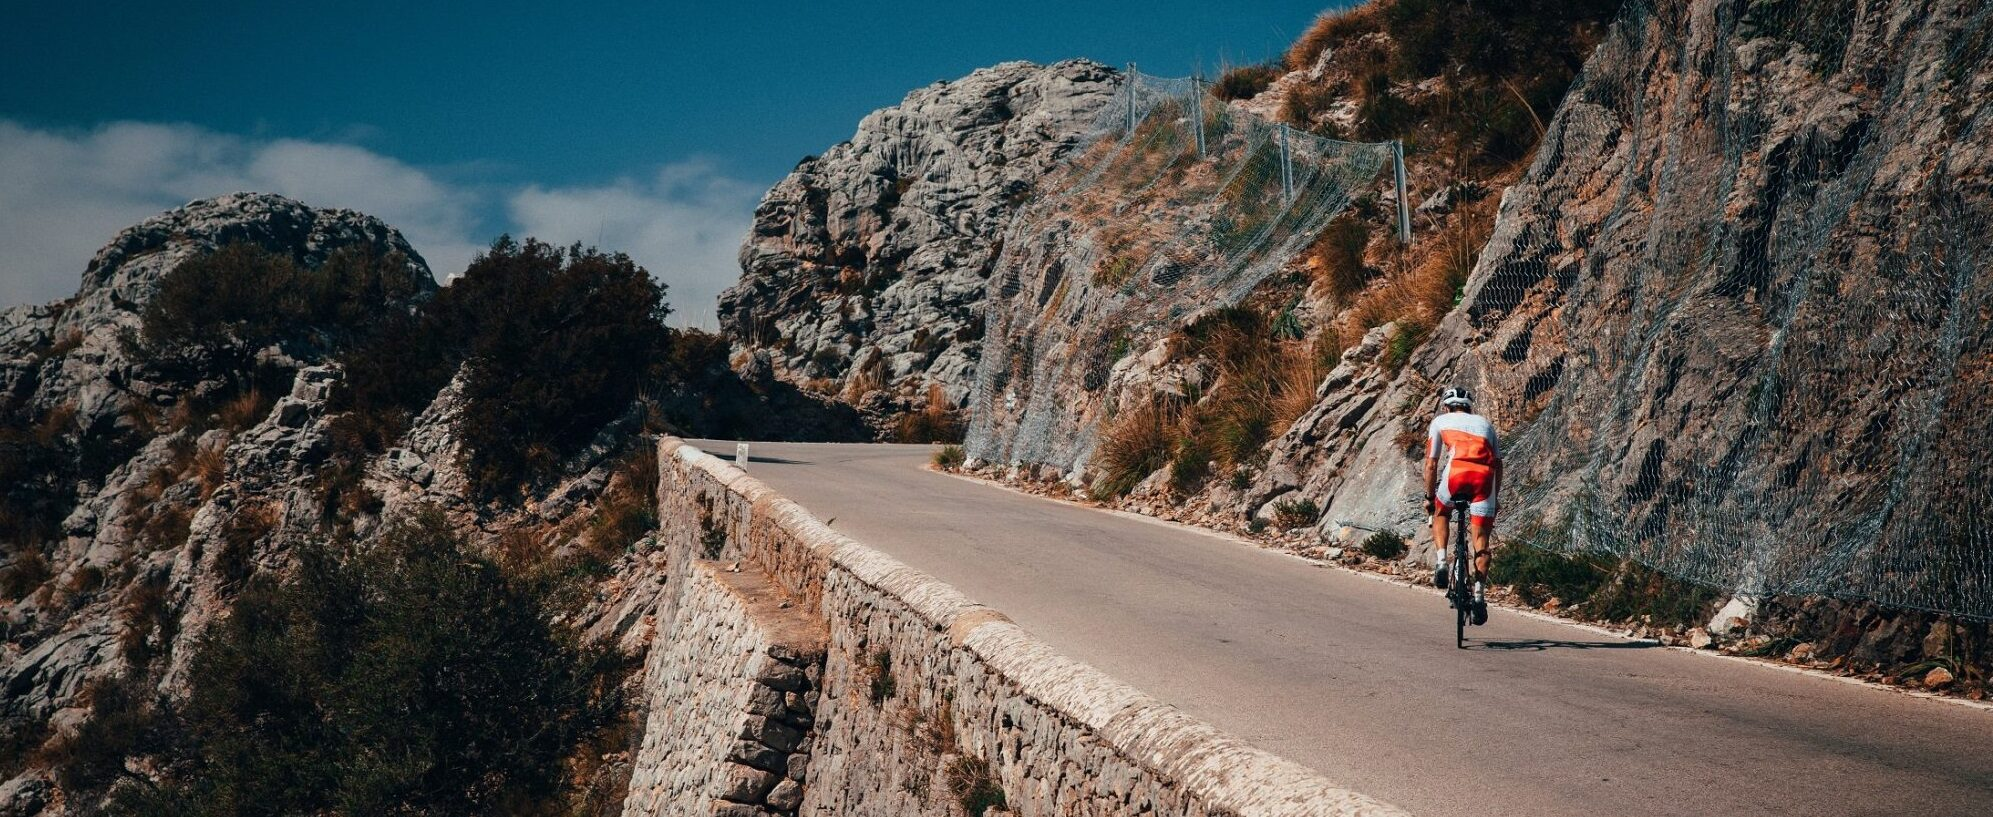 better triathlete seo content case study